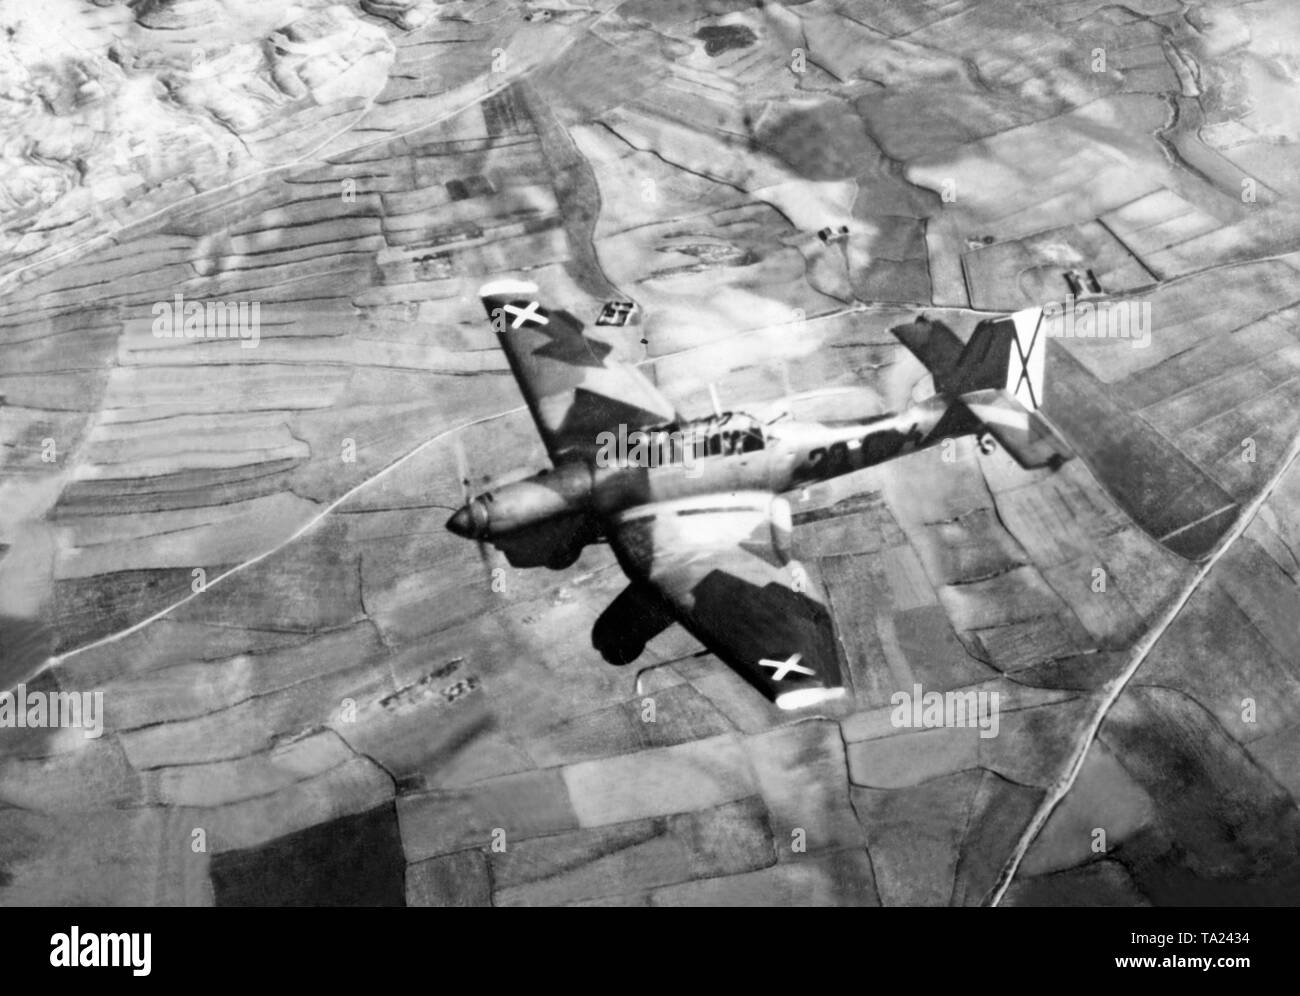 JU 87 bomber (Stuka) of the Condor Legion in mid-air in Spain, 1939. - Stock Image